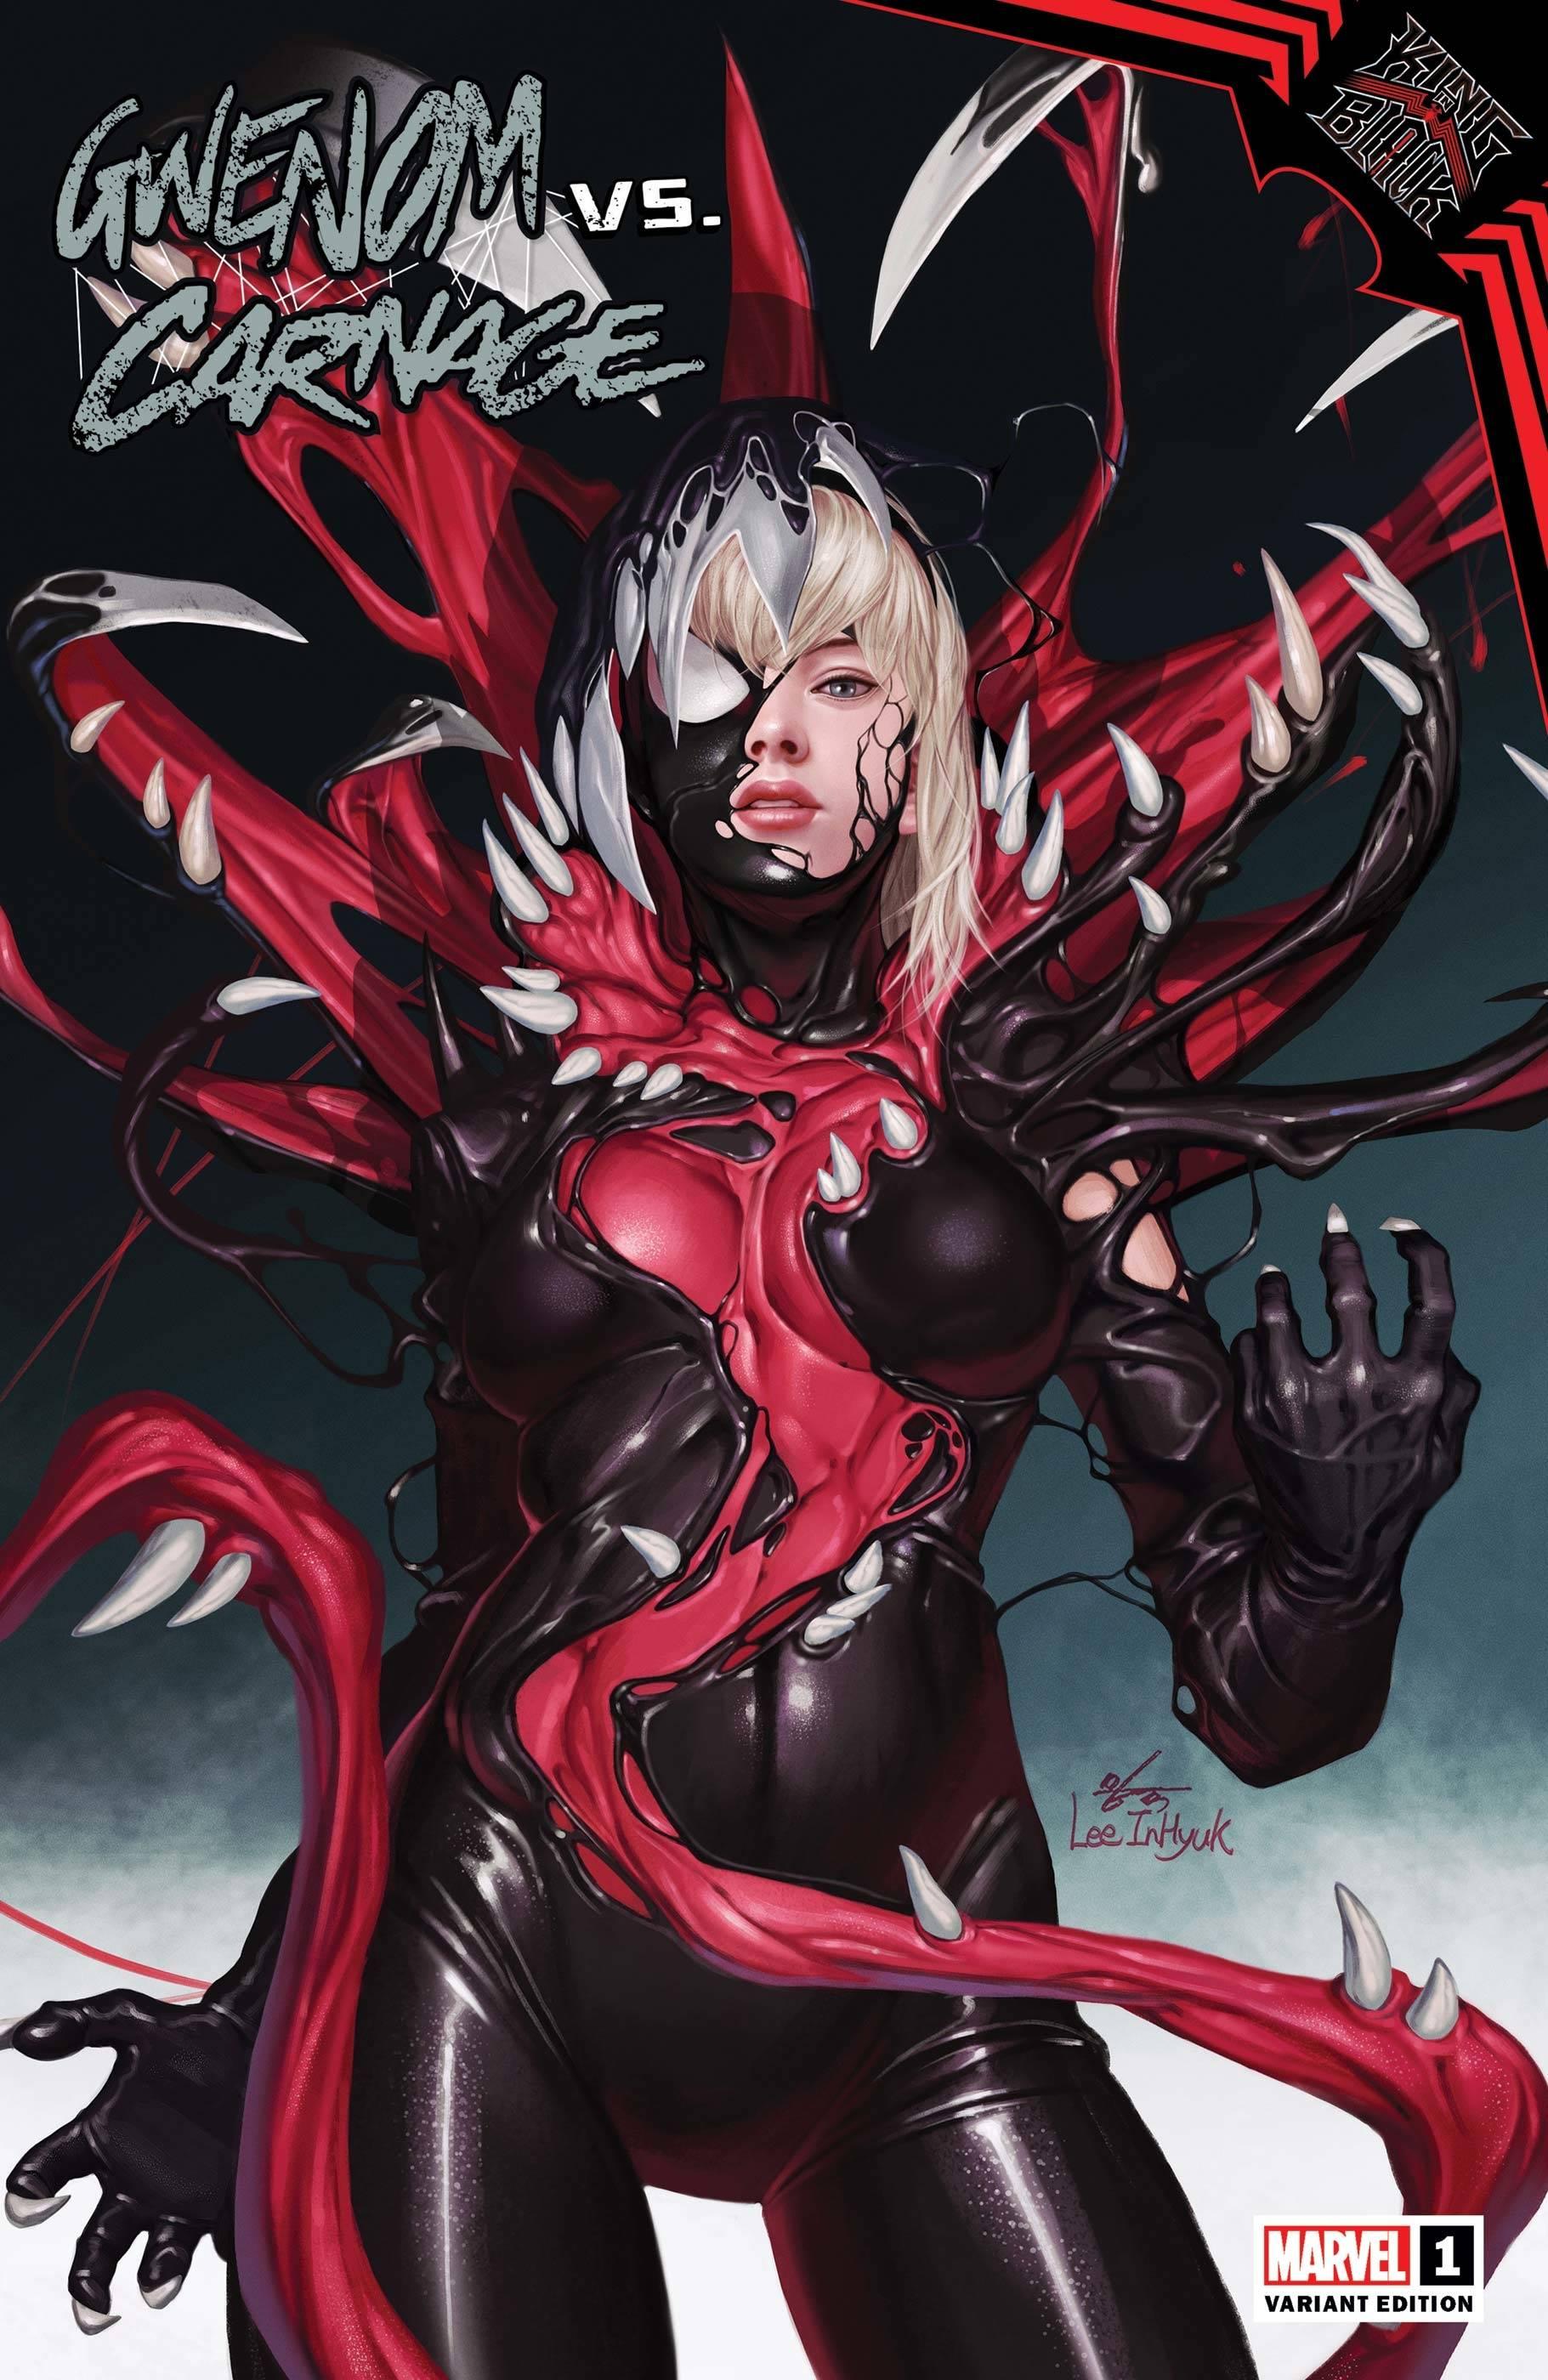 King In Black - Gwenom Vs Carnage #1